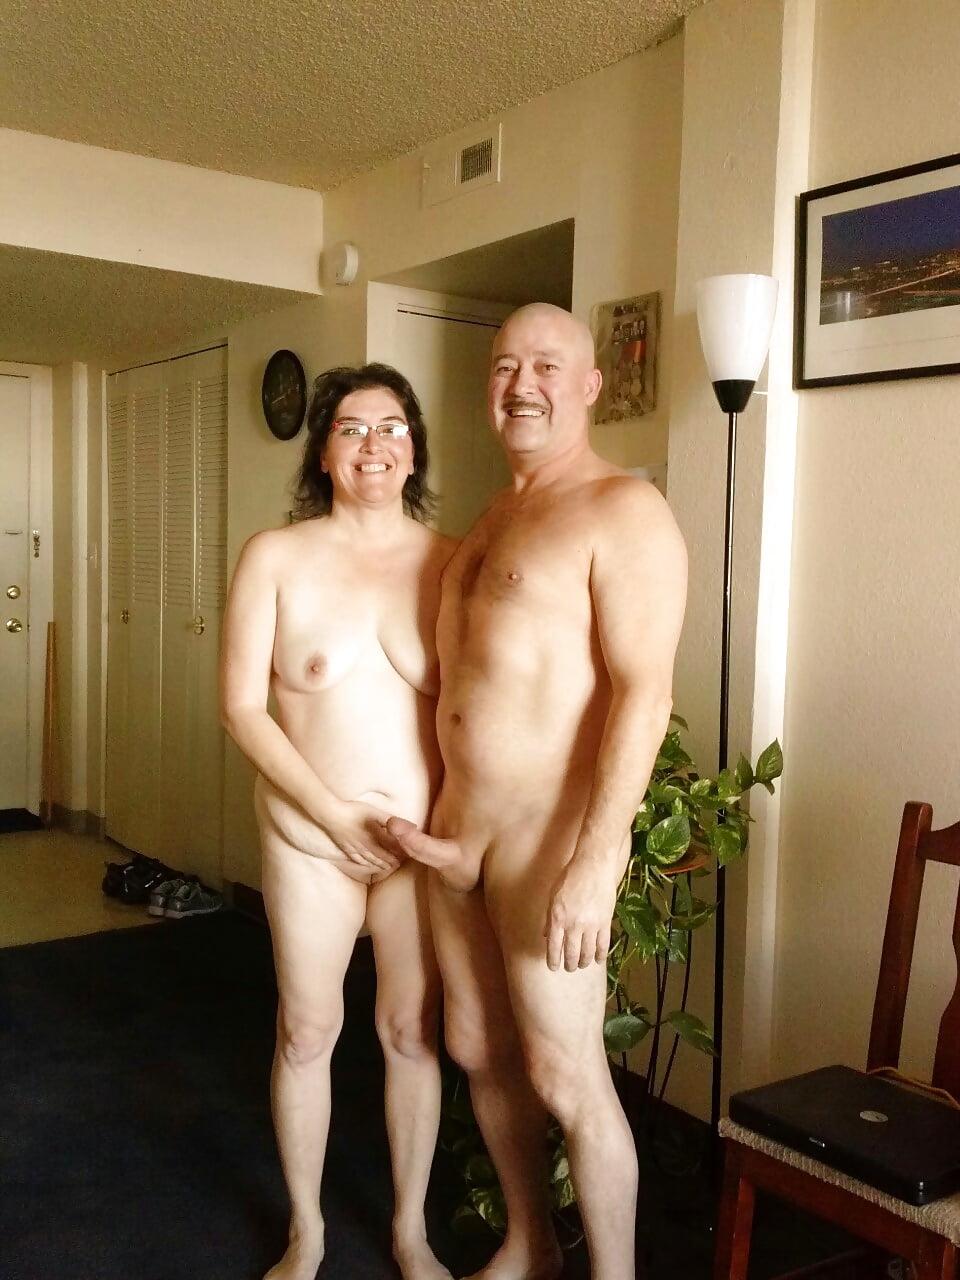 Real Couples Erection Edition - 12 Pics  Xhamster